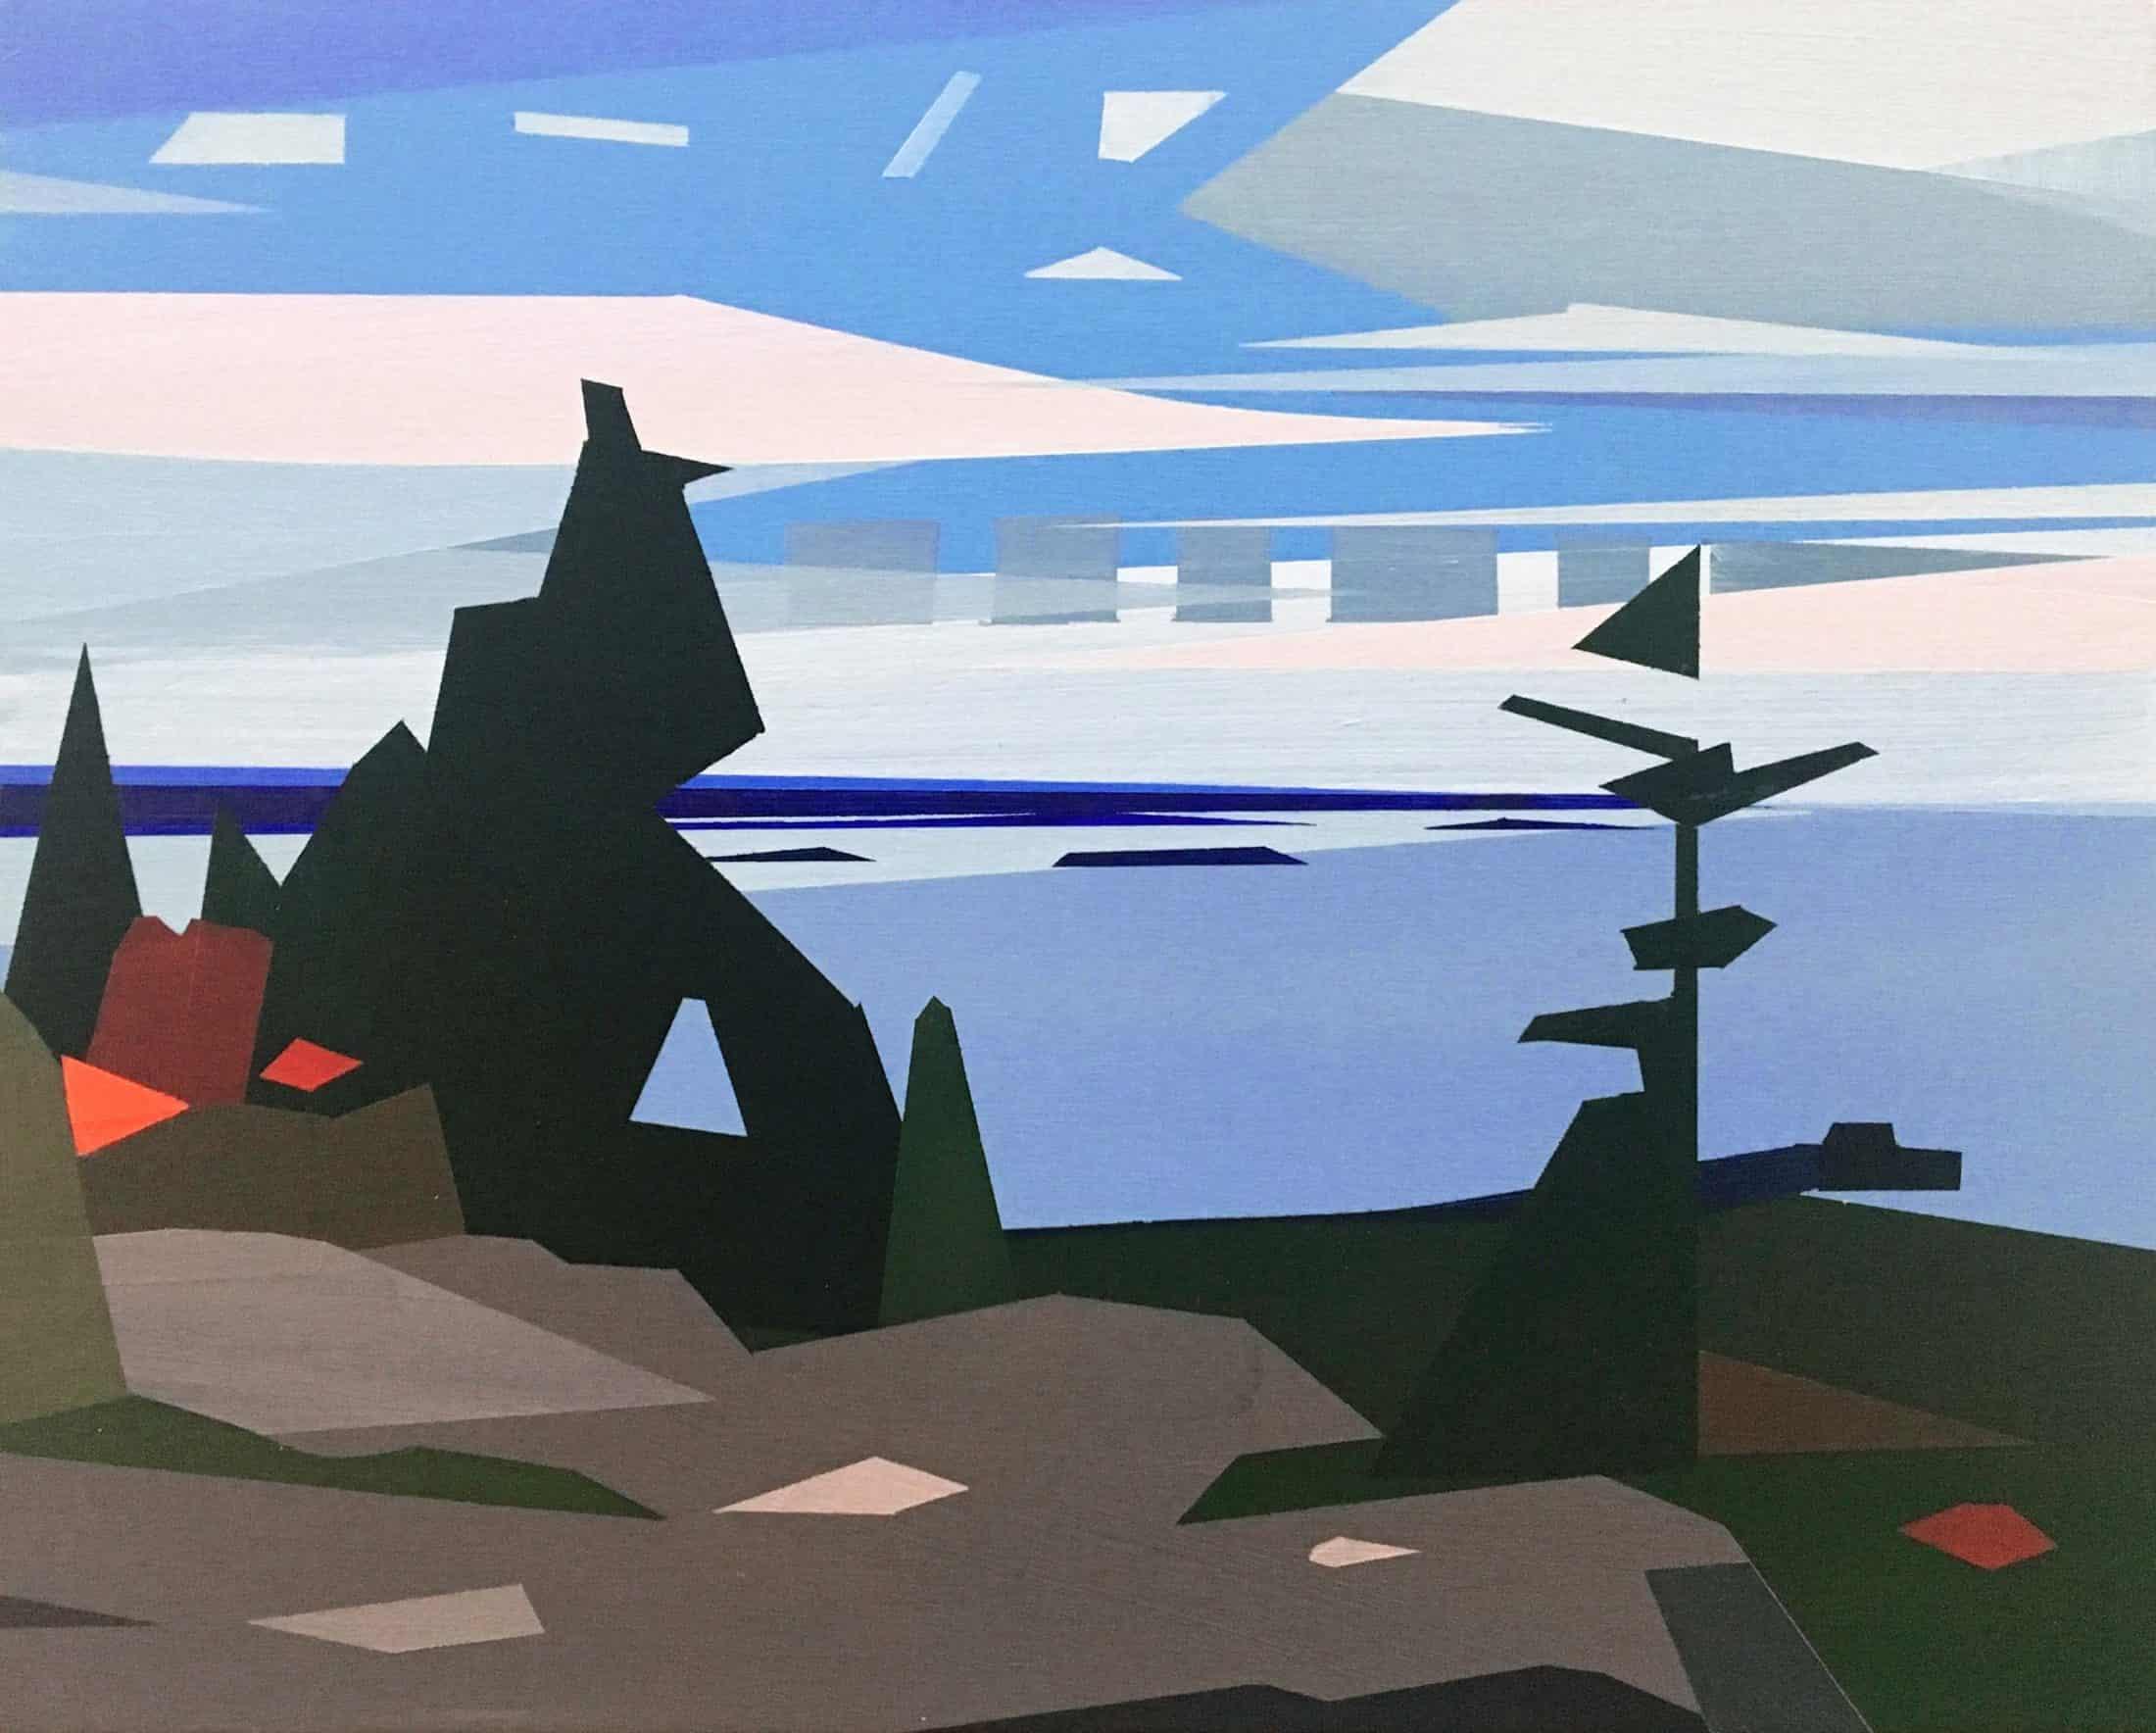 Greta Van Campen, Shapes, Autumn Hike, 2018, acrylic on panel, 8 x 10 inches